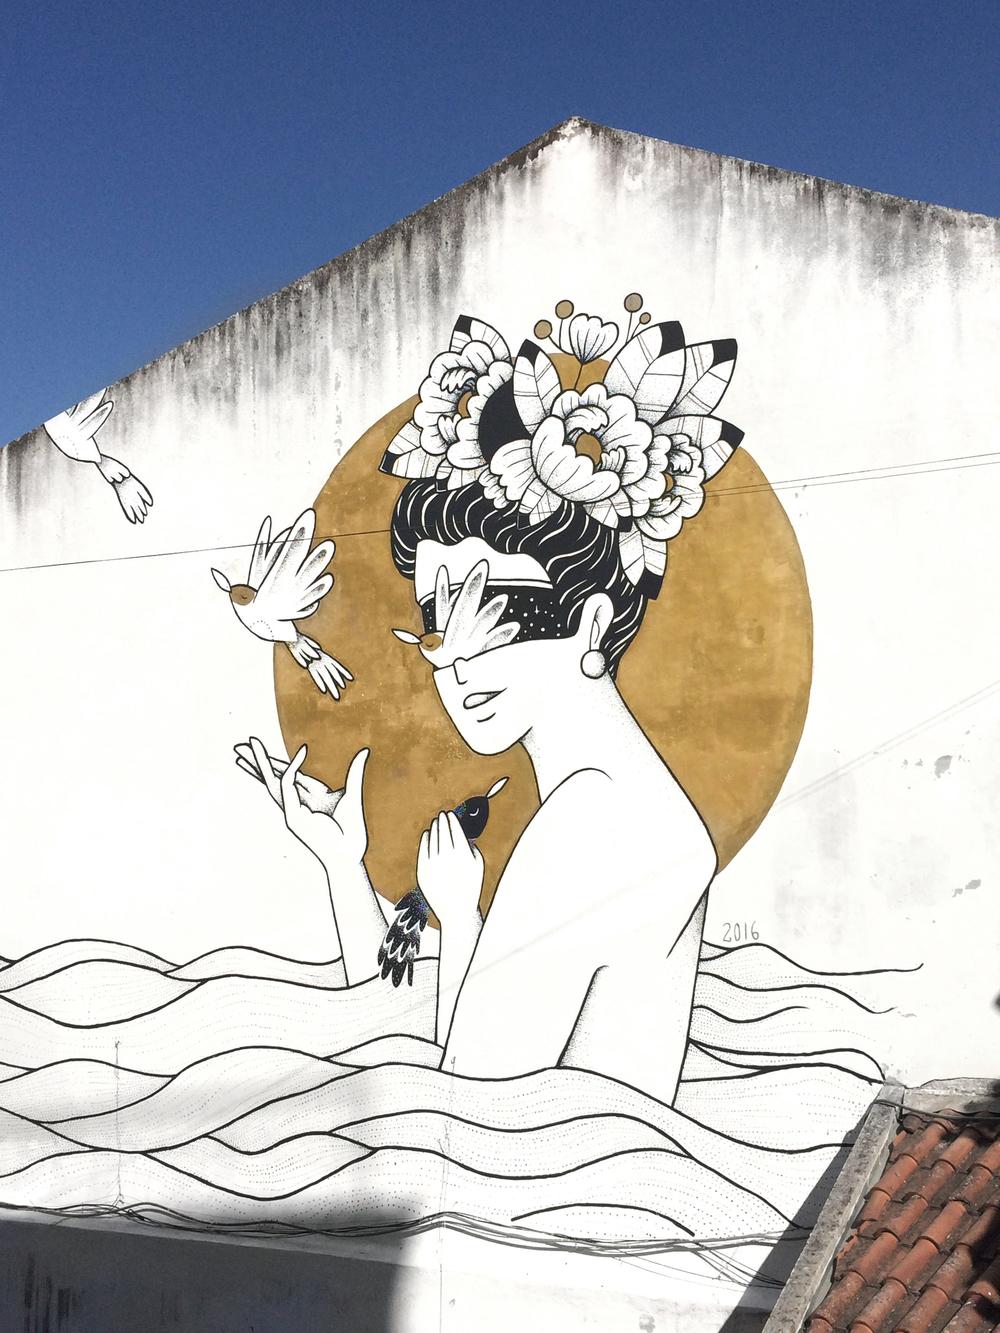 06_Mural_Lisboa_final2.jpg